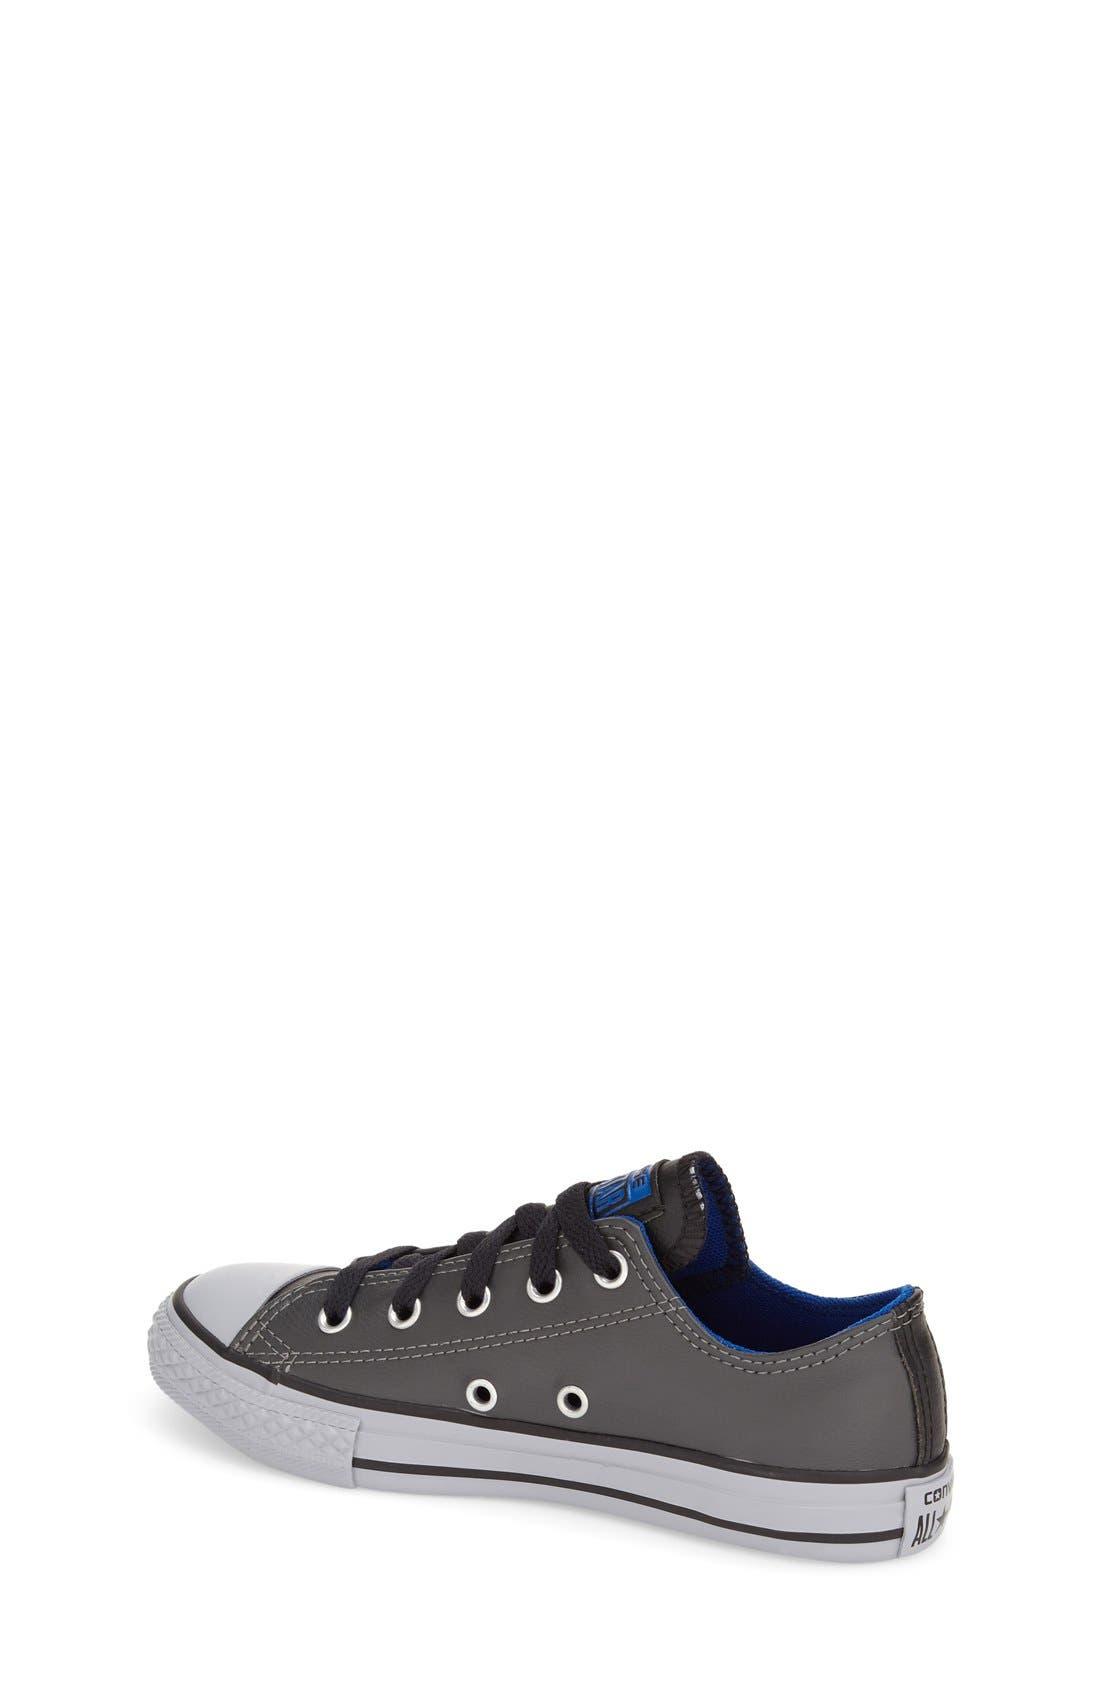 Alternate Image 2  - Converse Chuck Taylor® All Star® 'Ox' Sneaker (Toddler, Little Kid & Big Kid)